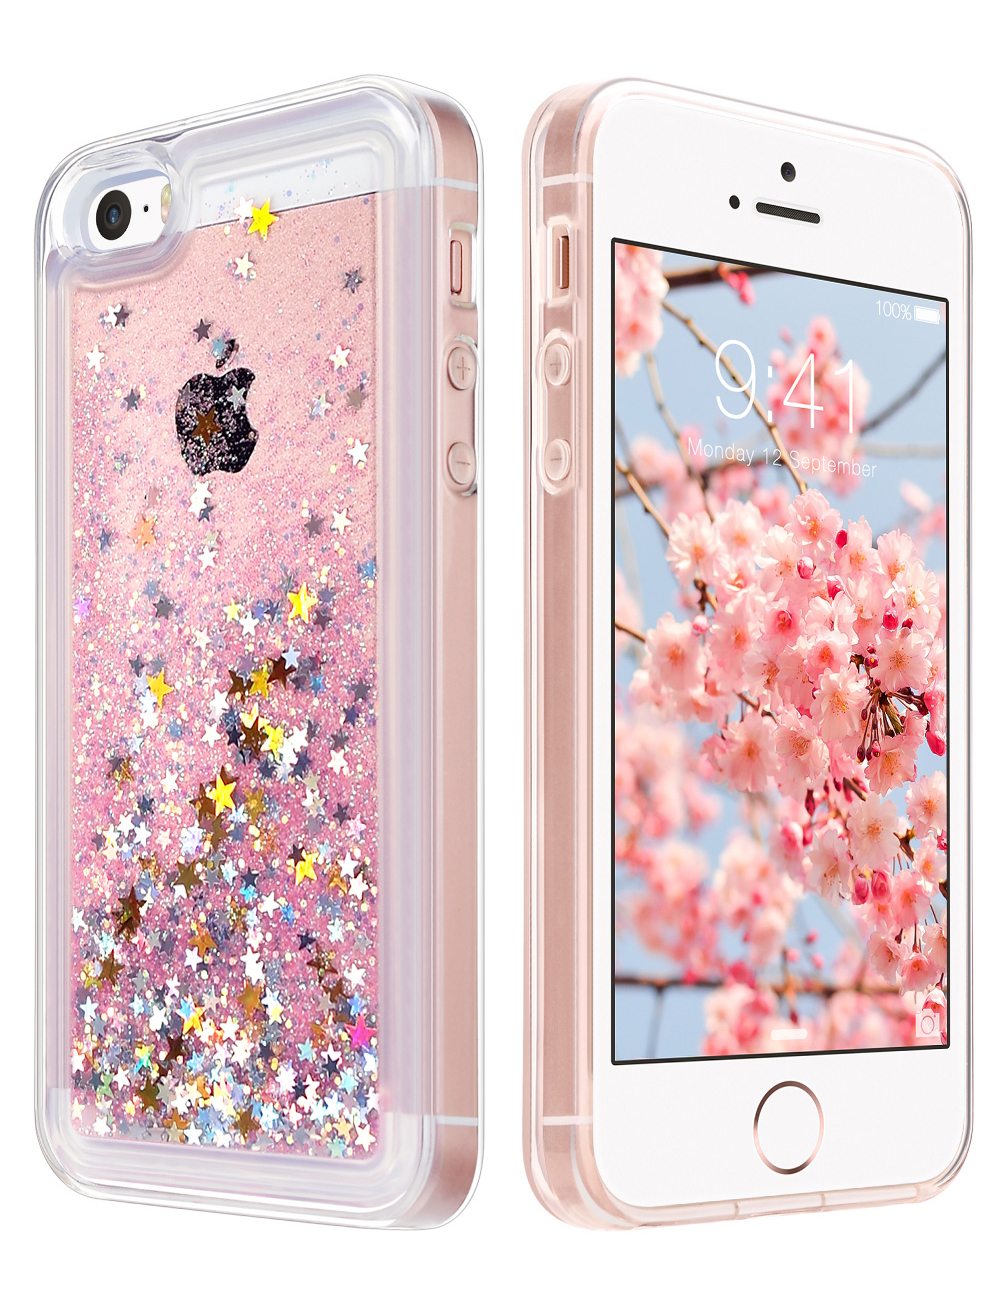 Clear Unicorn Glitter iPhone Case for